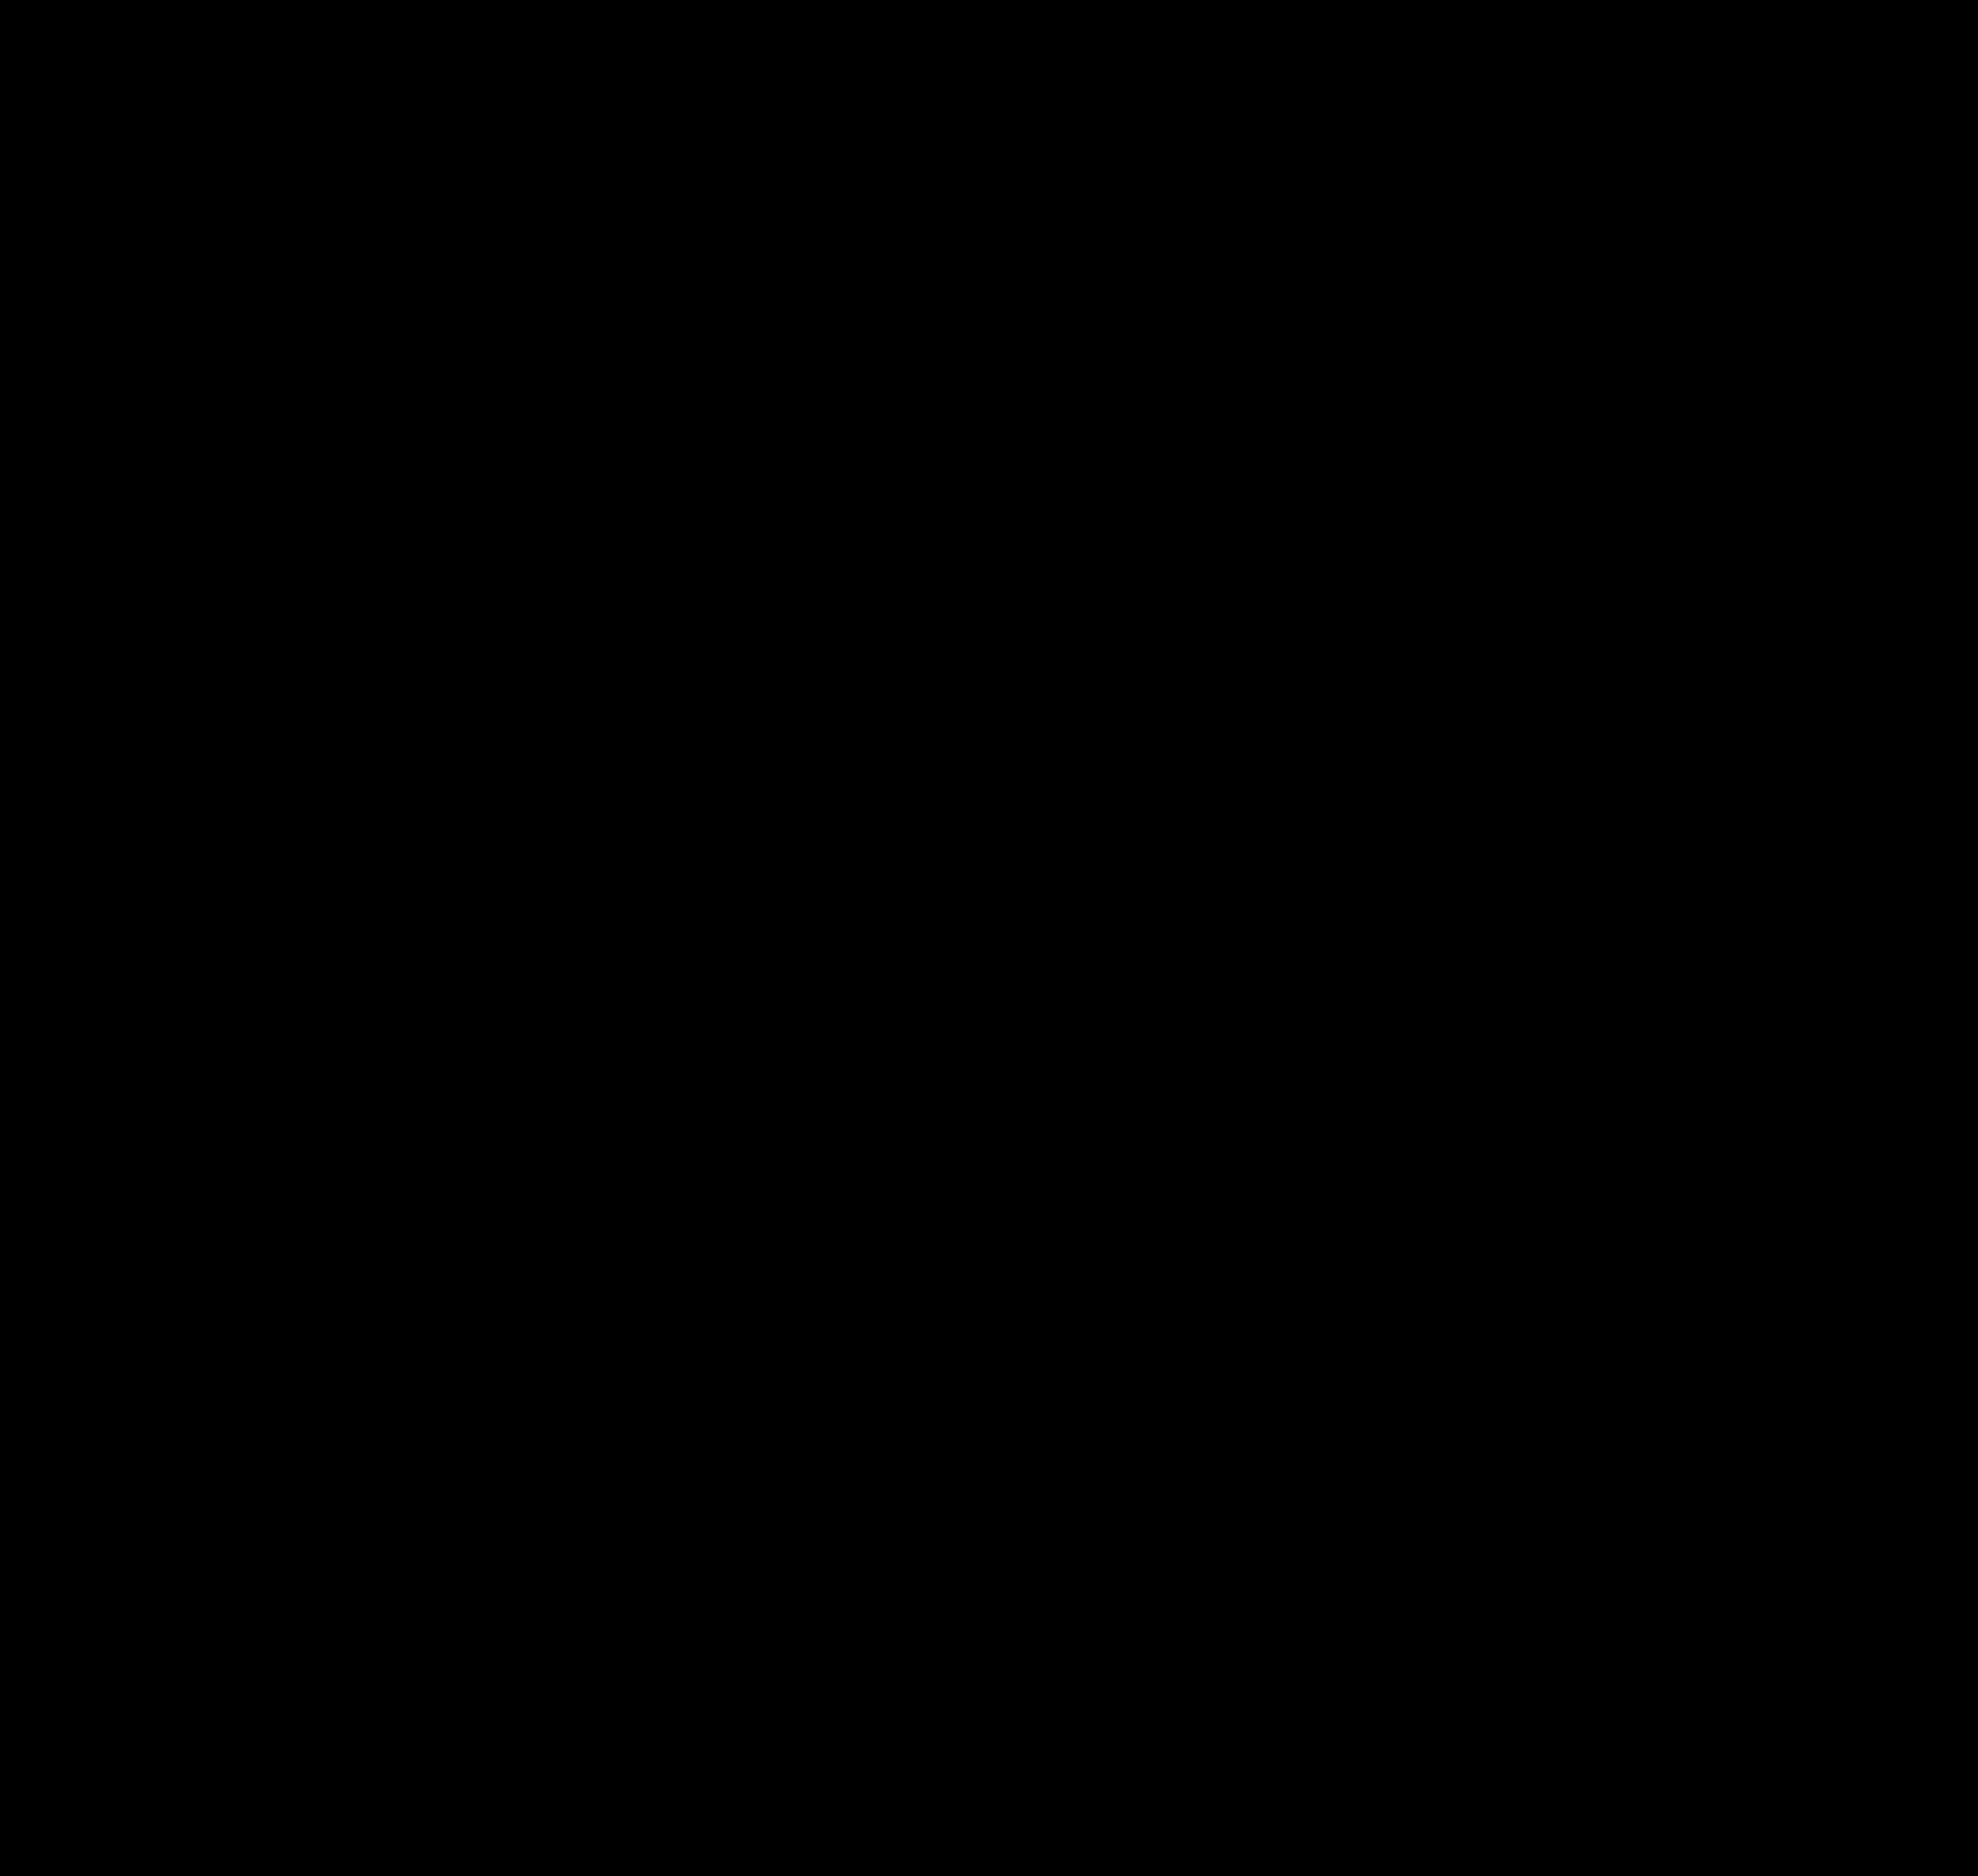 Biohazard Symbol PNG - 8703